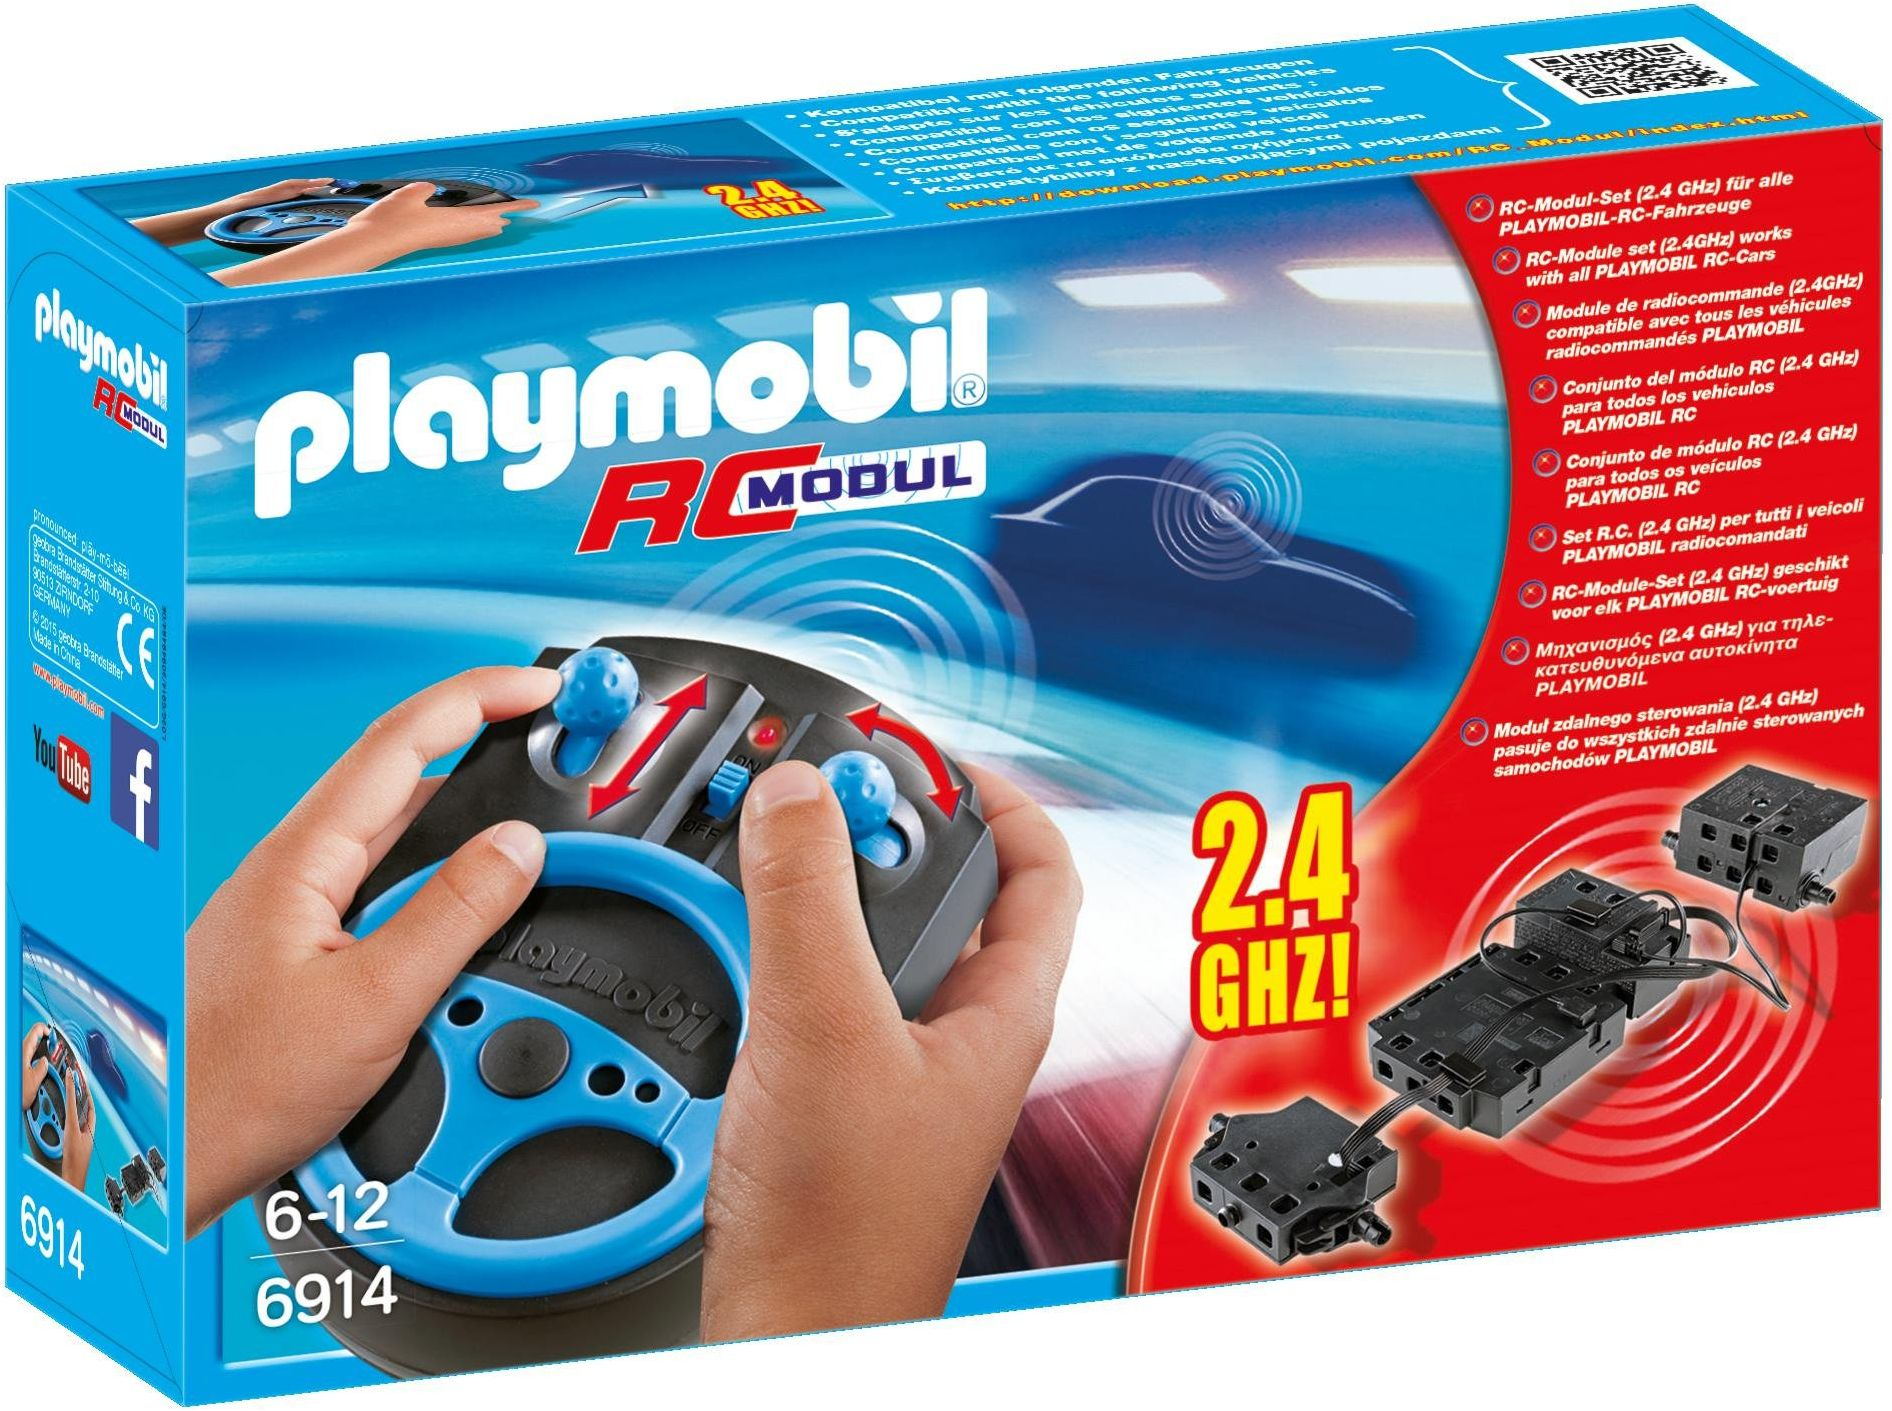 PLAYMOBIL City Action 6914 RC Moduł Plus Set, od 6 lat